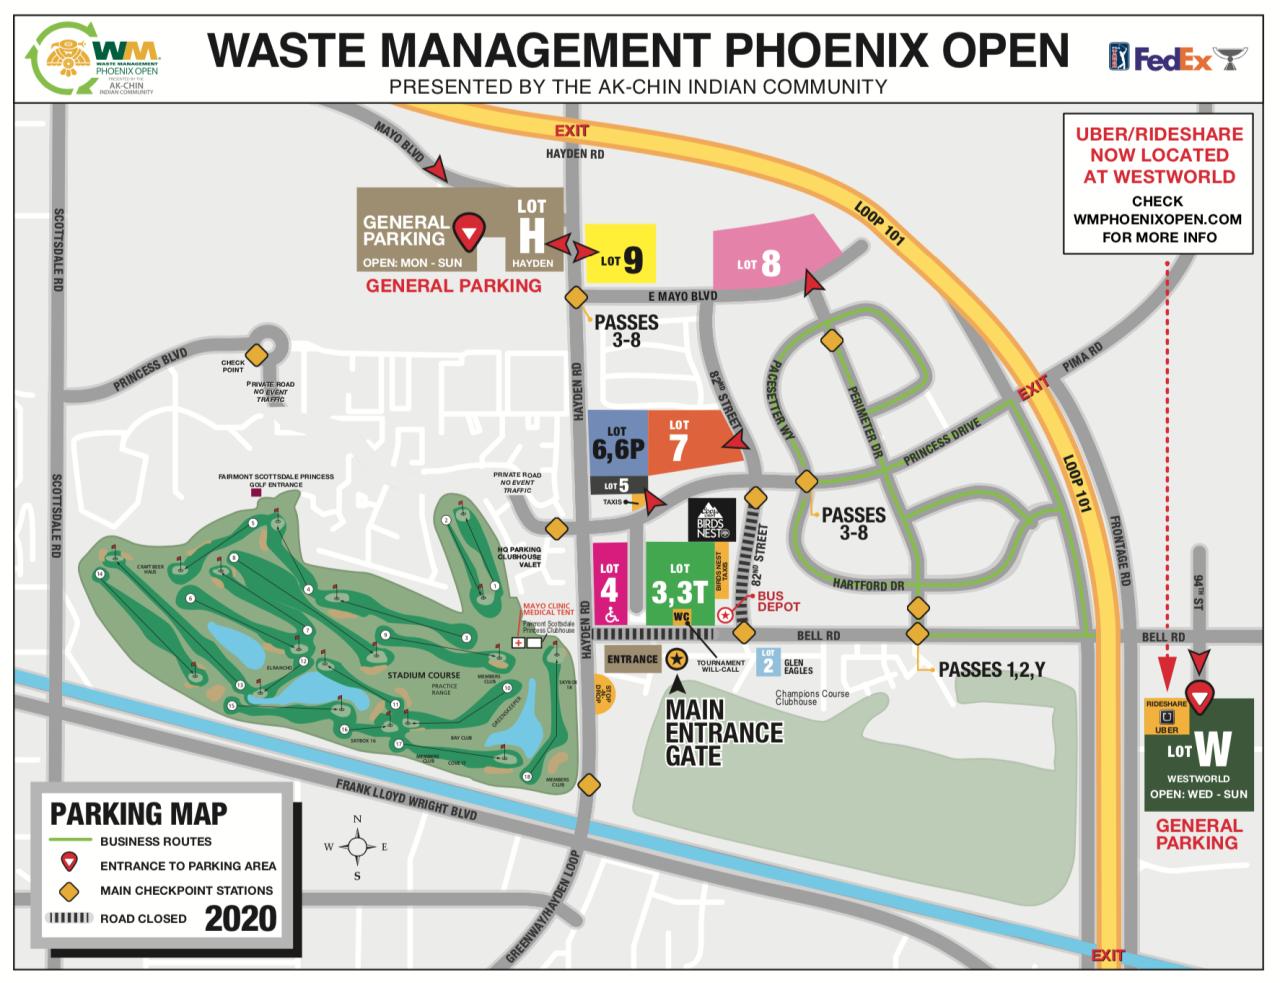 2020 WM Phoenix Open Parking Map